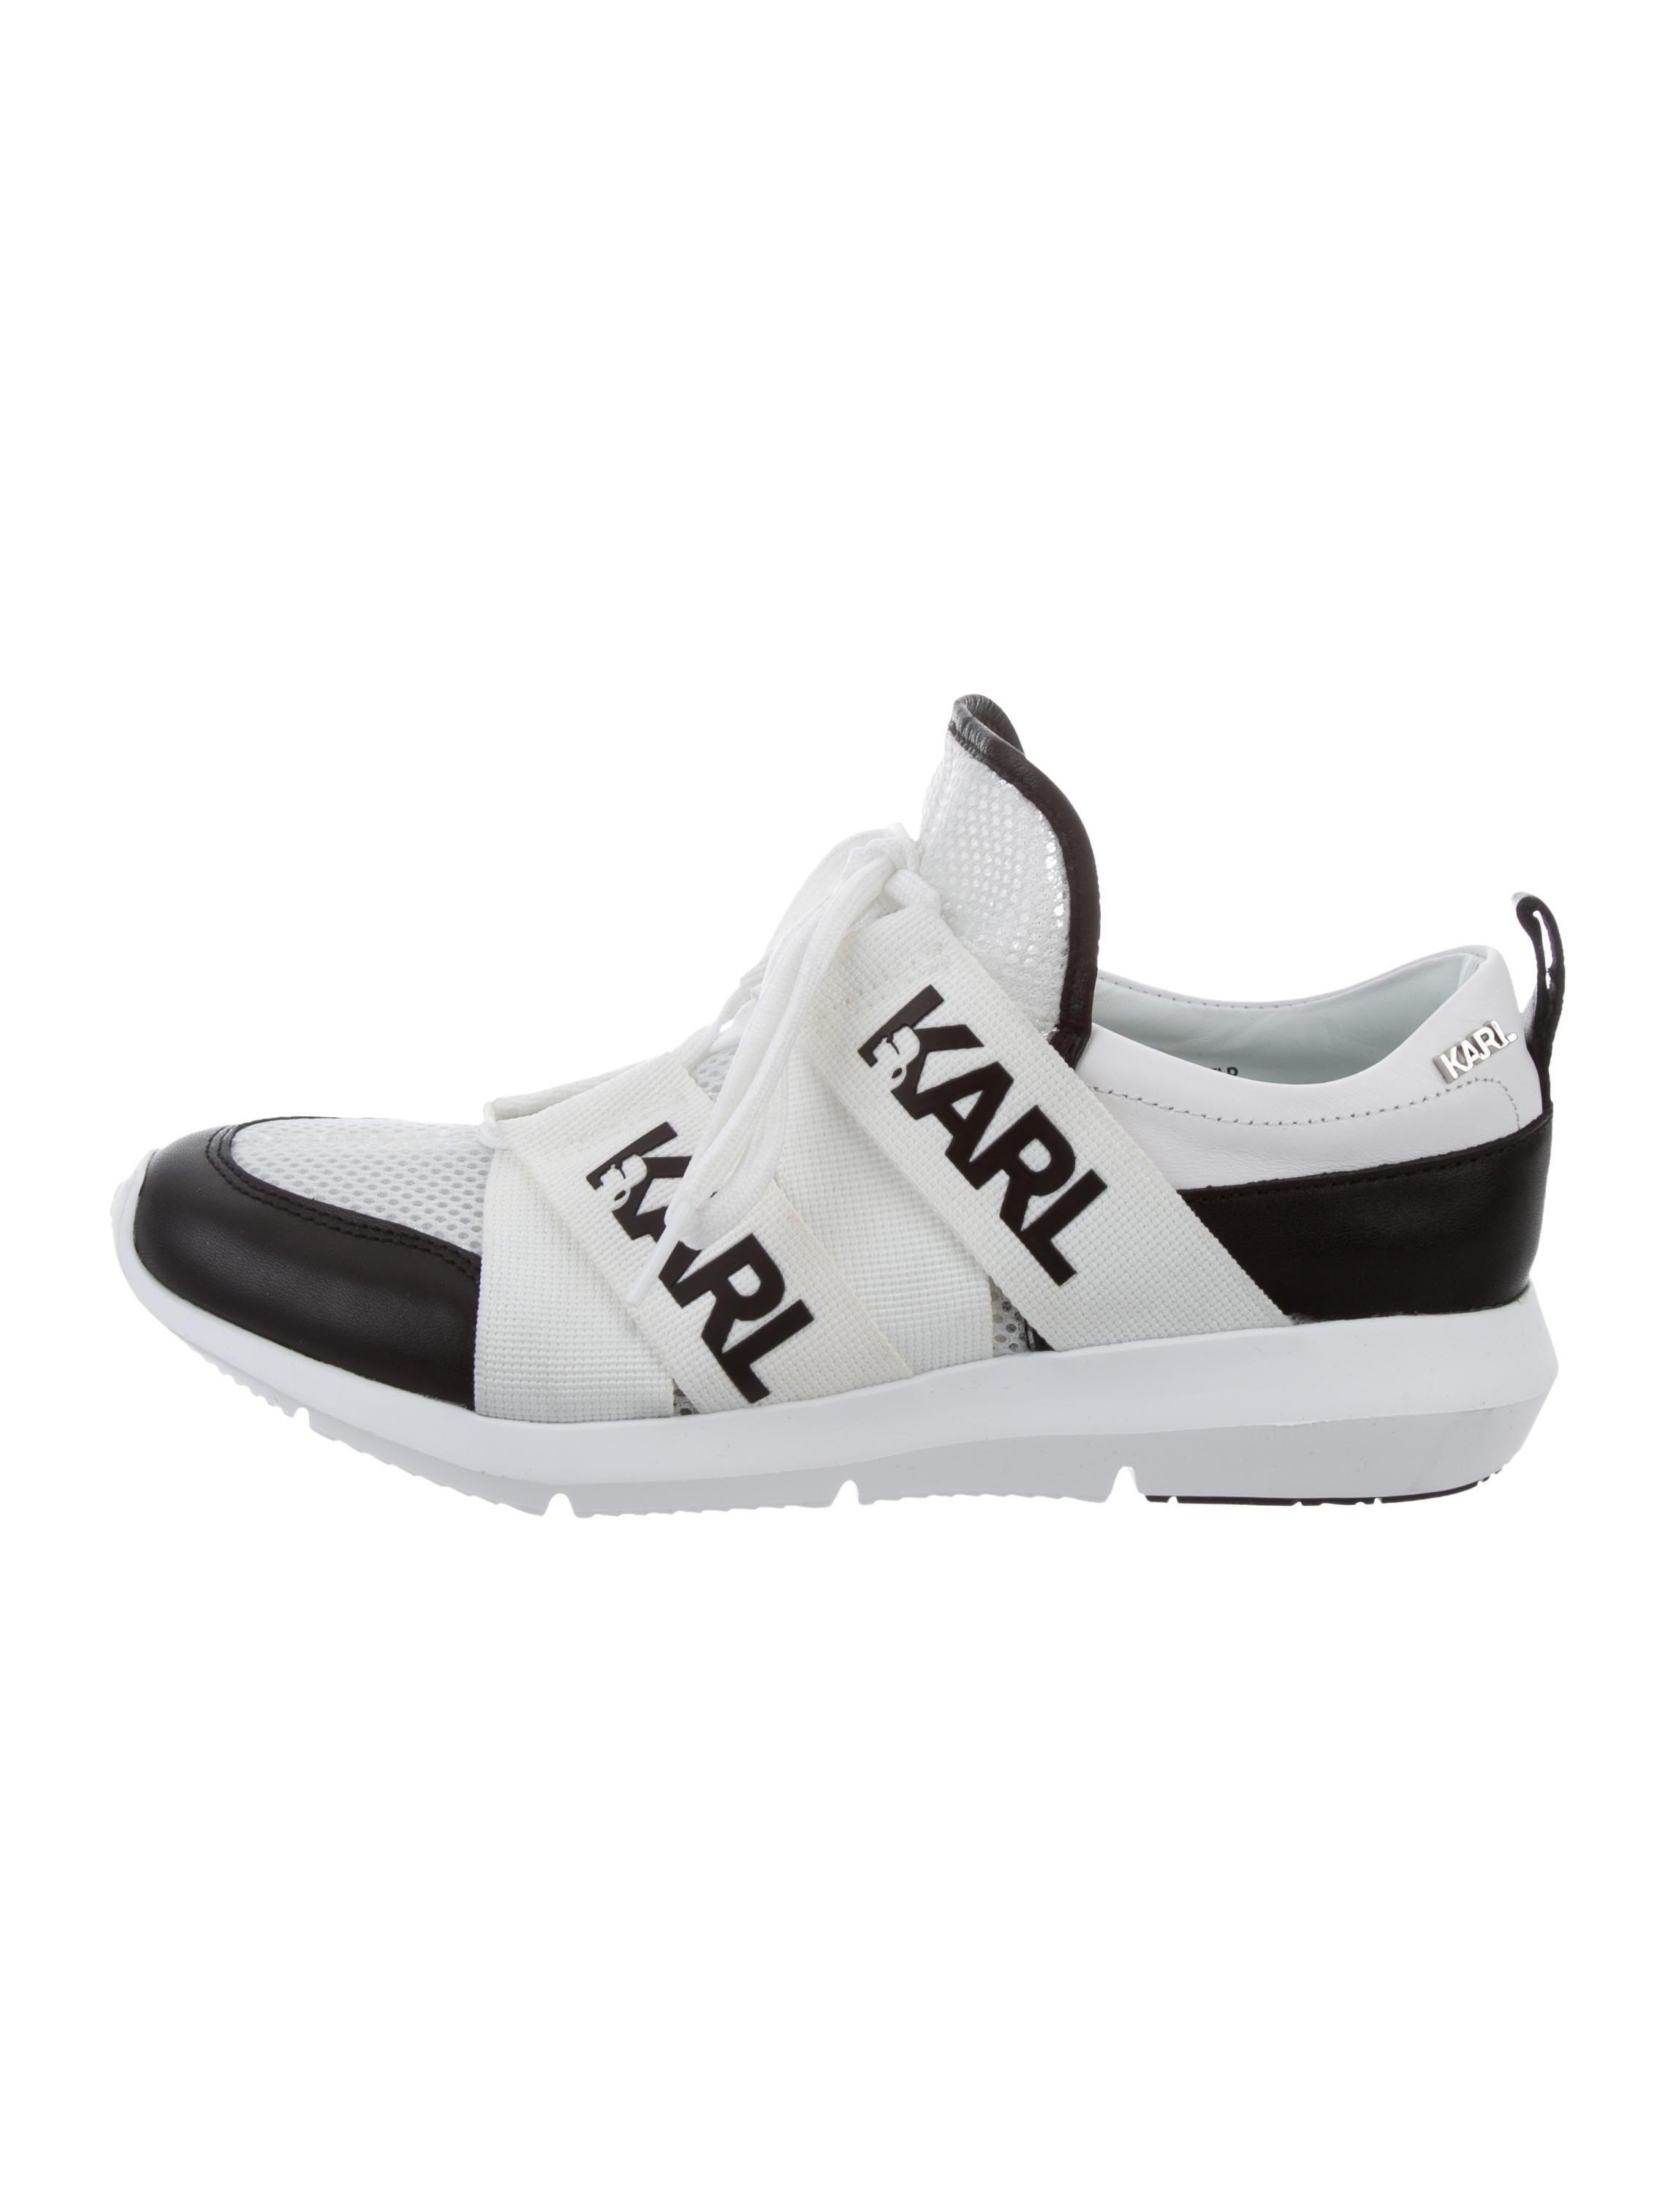 Slip on Sneakers for Women On Sale, Black, Rubber, 2017, 3.5 4.5 6.5 7.5 8.5 Karl Lagerfeld